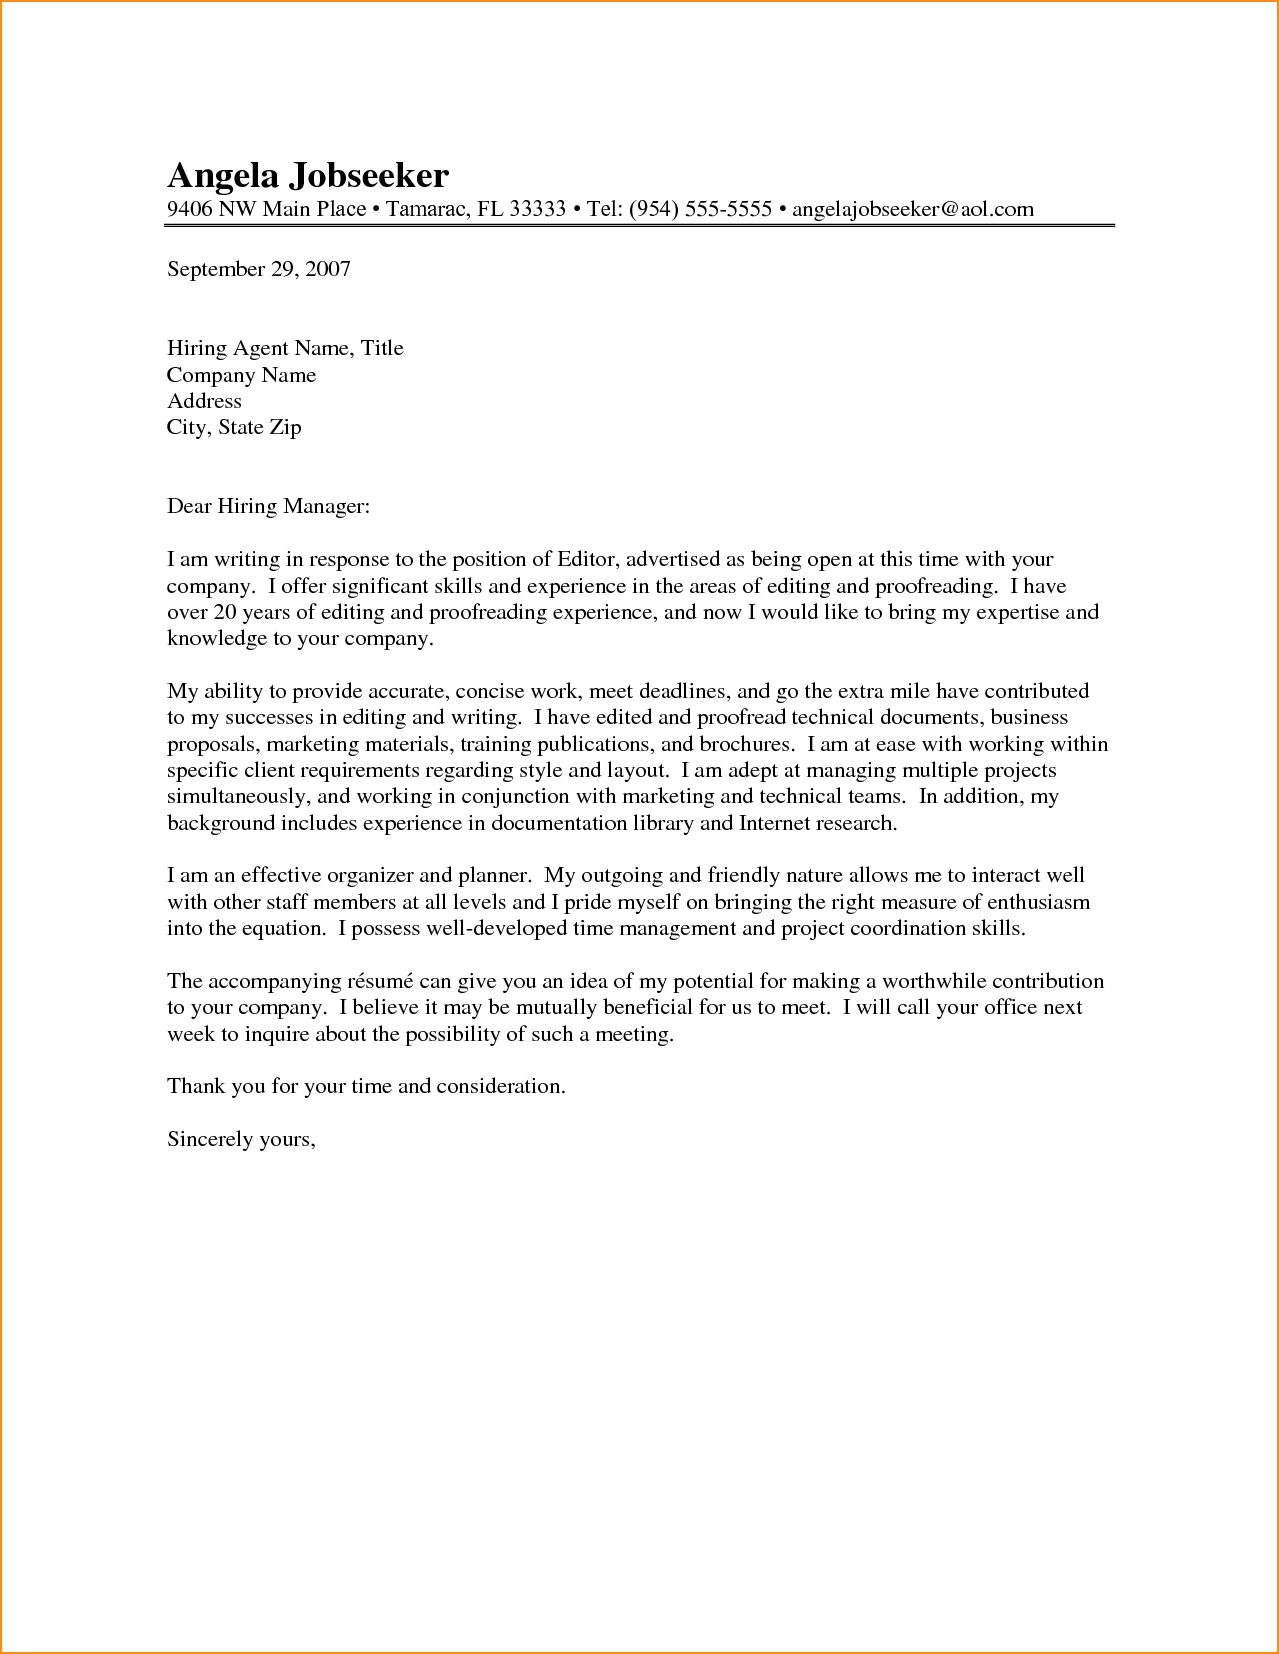 10 Elegant Letter To The Editor Ideas brilliant ideas of a letter to the editor example basic job 2020